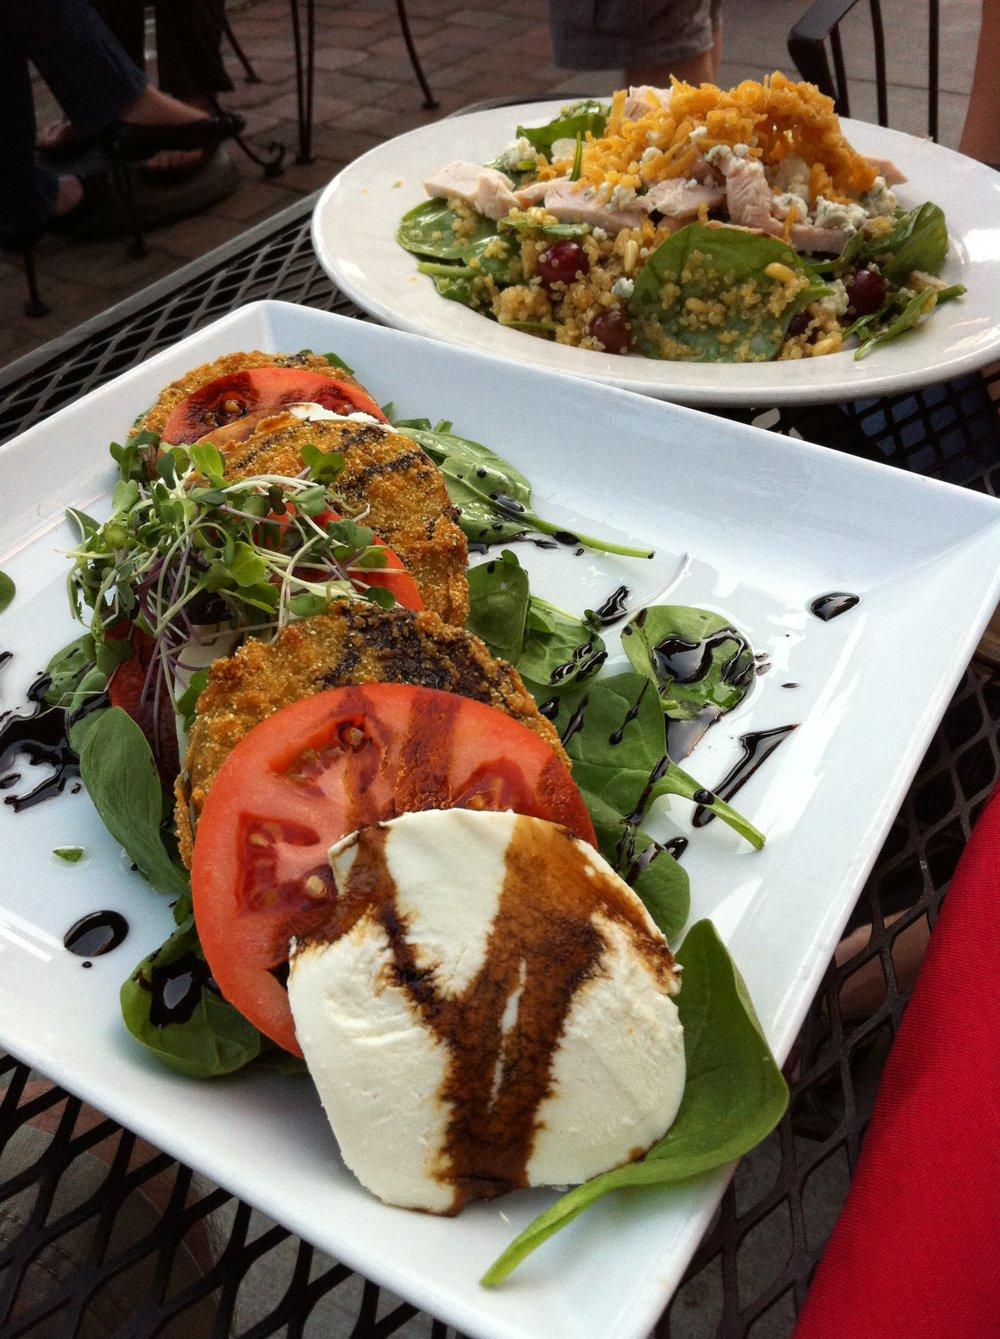 Salad Electric Cheetah Grand Rapids